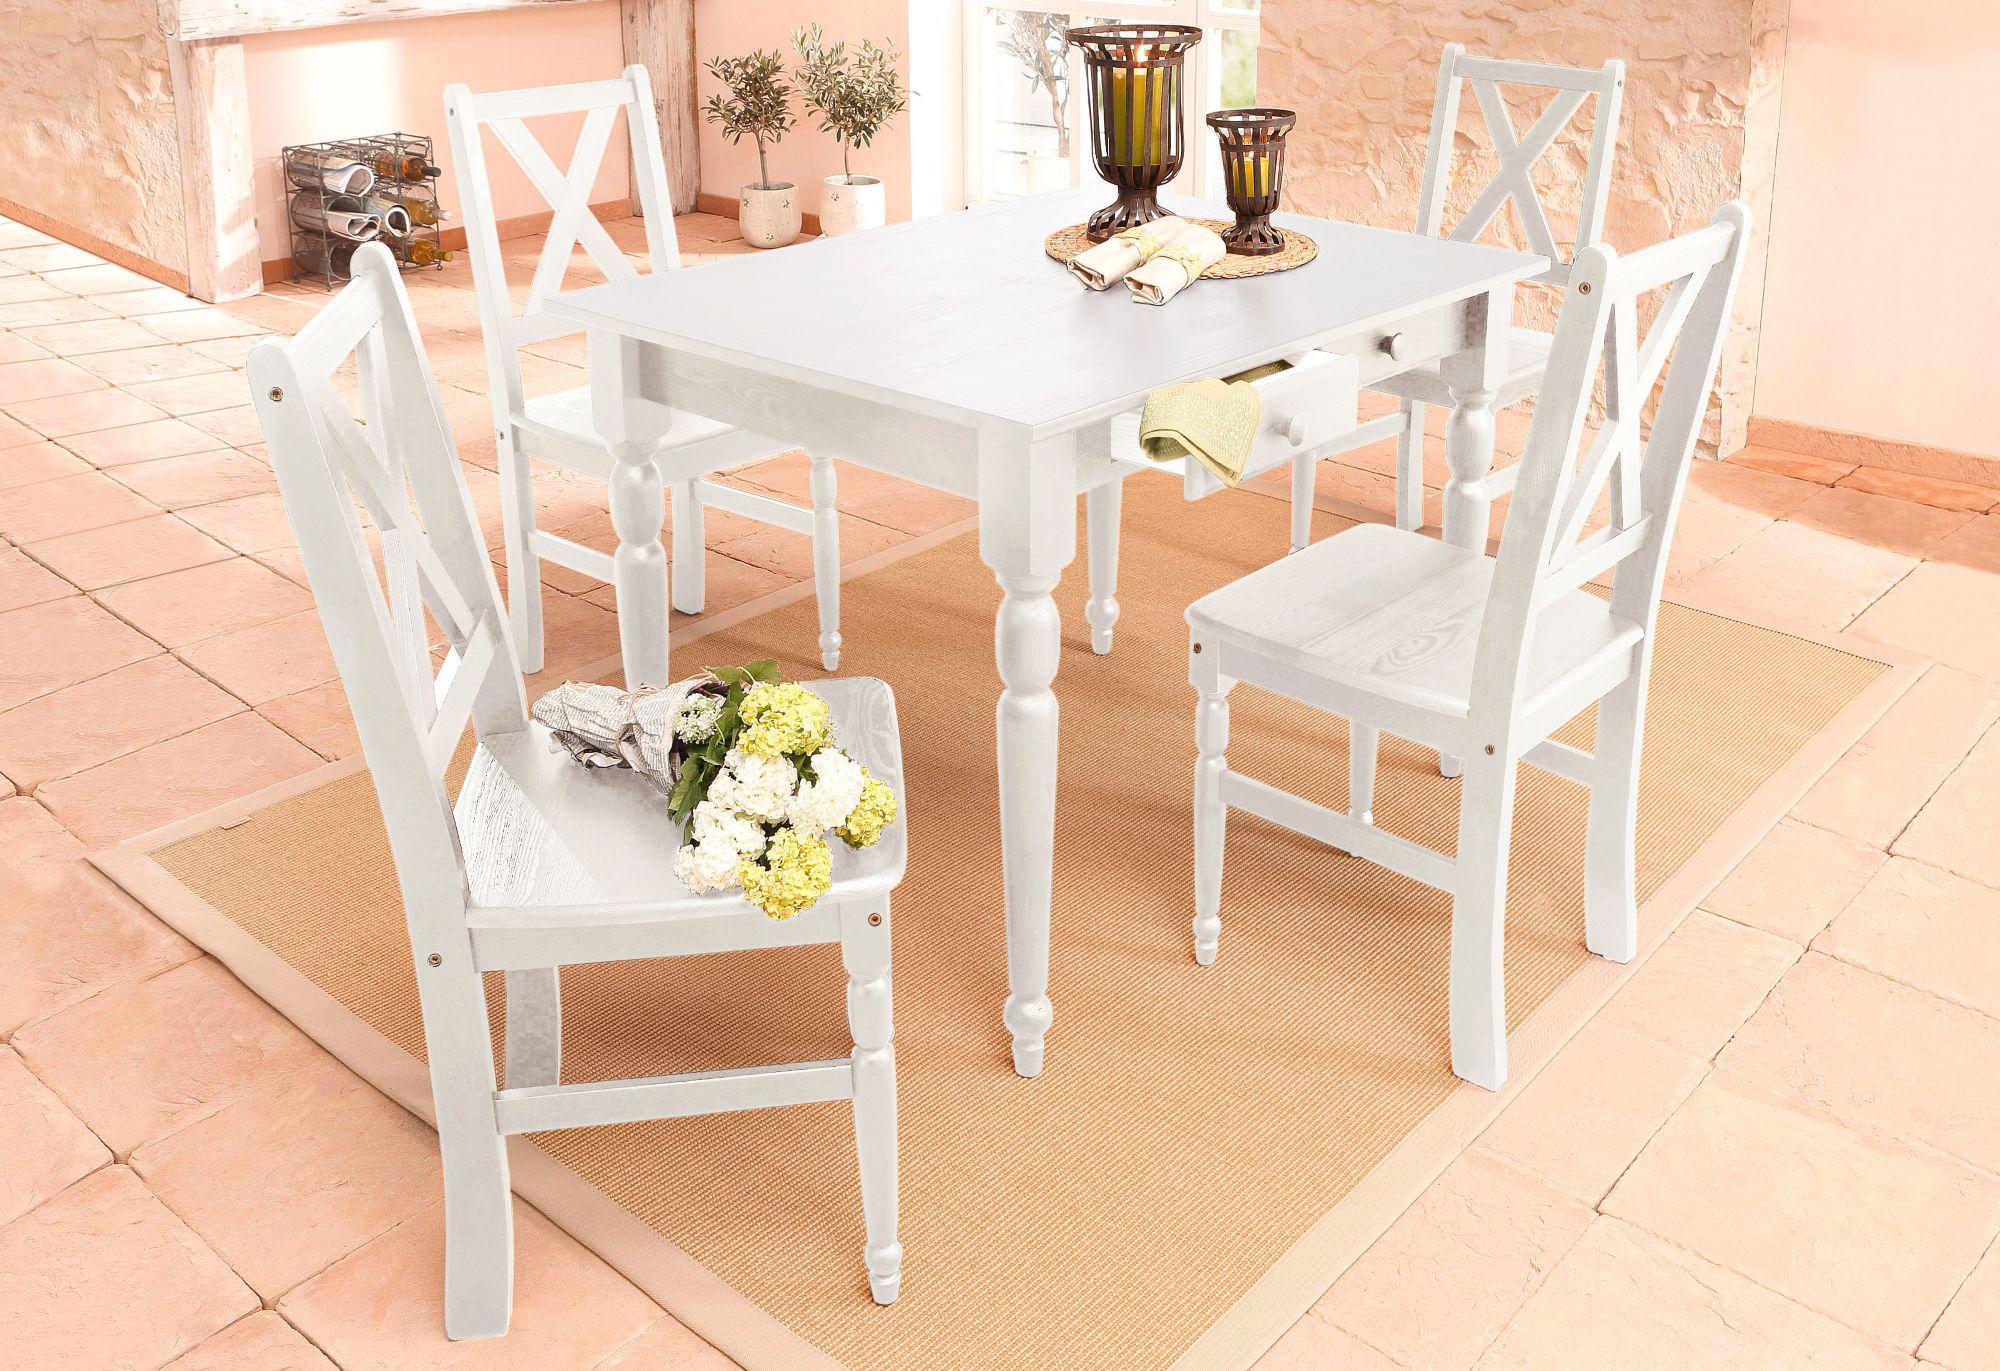 essgruppe home affaire 5 tlg schwab versand essgruppen. Black Bedroom Furniture Sets. Home Design Ideas